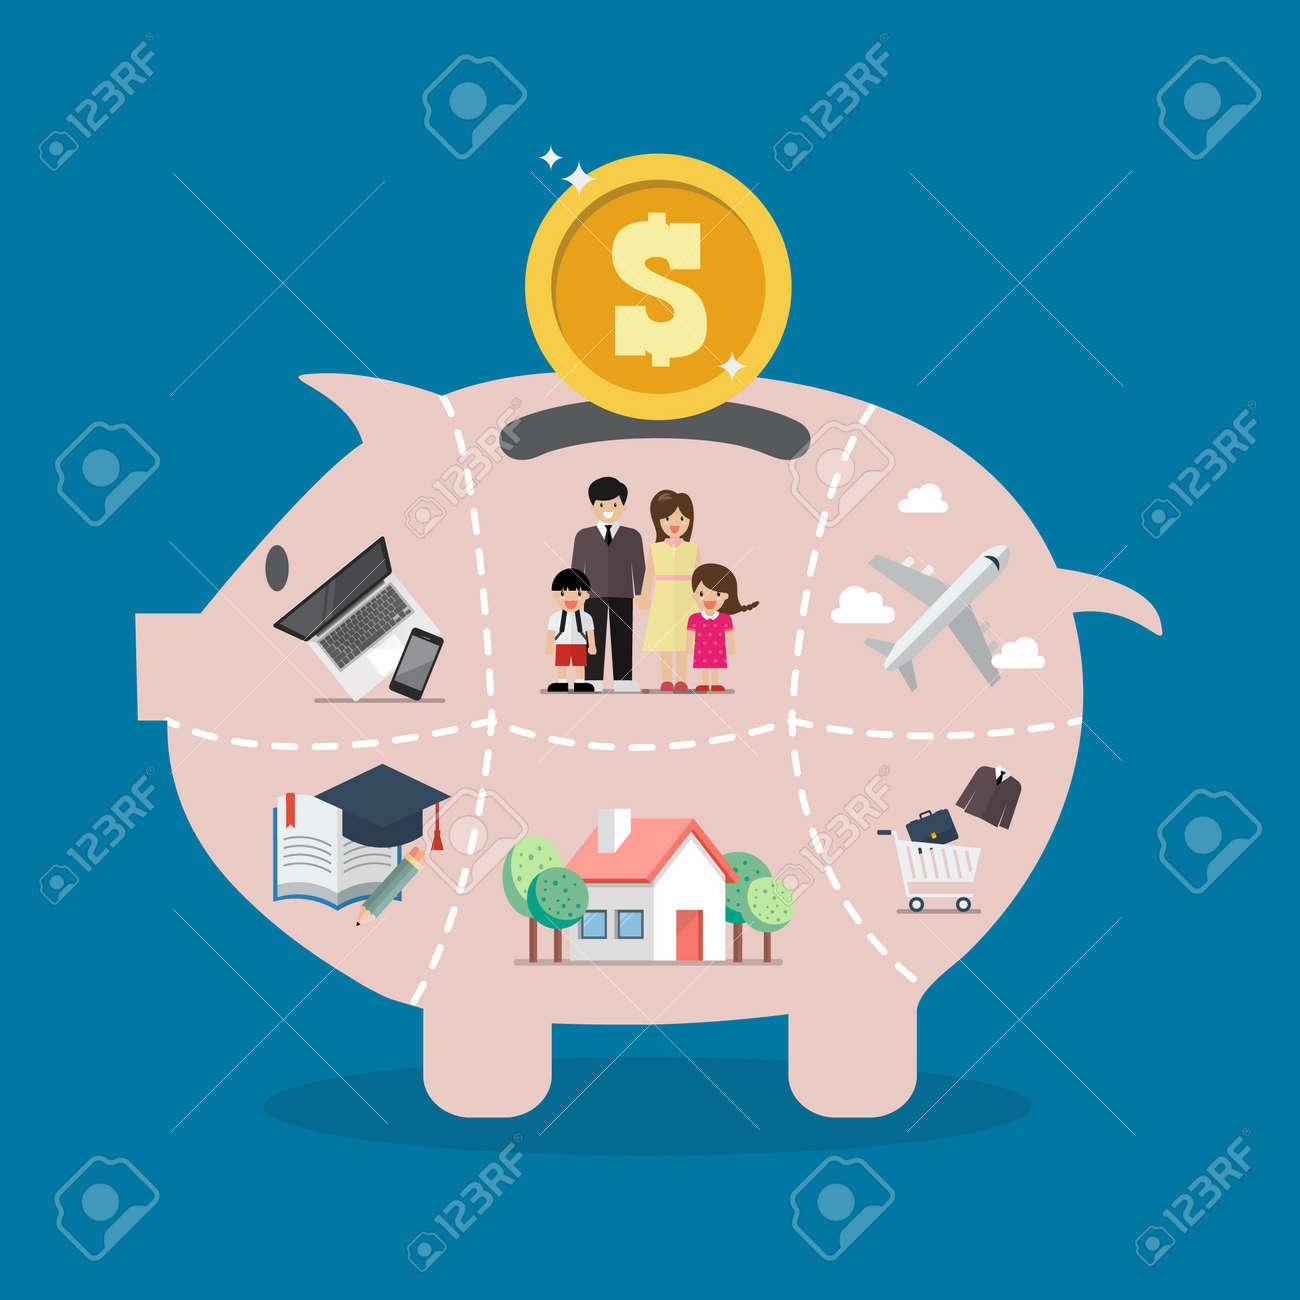 Piggy bank saving money portion for life. Vector illustration - 114960345